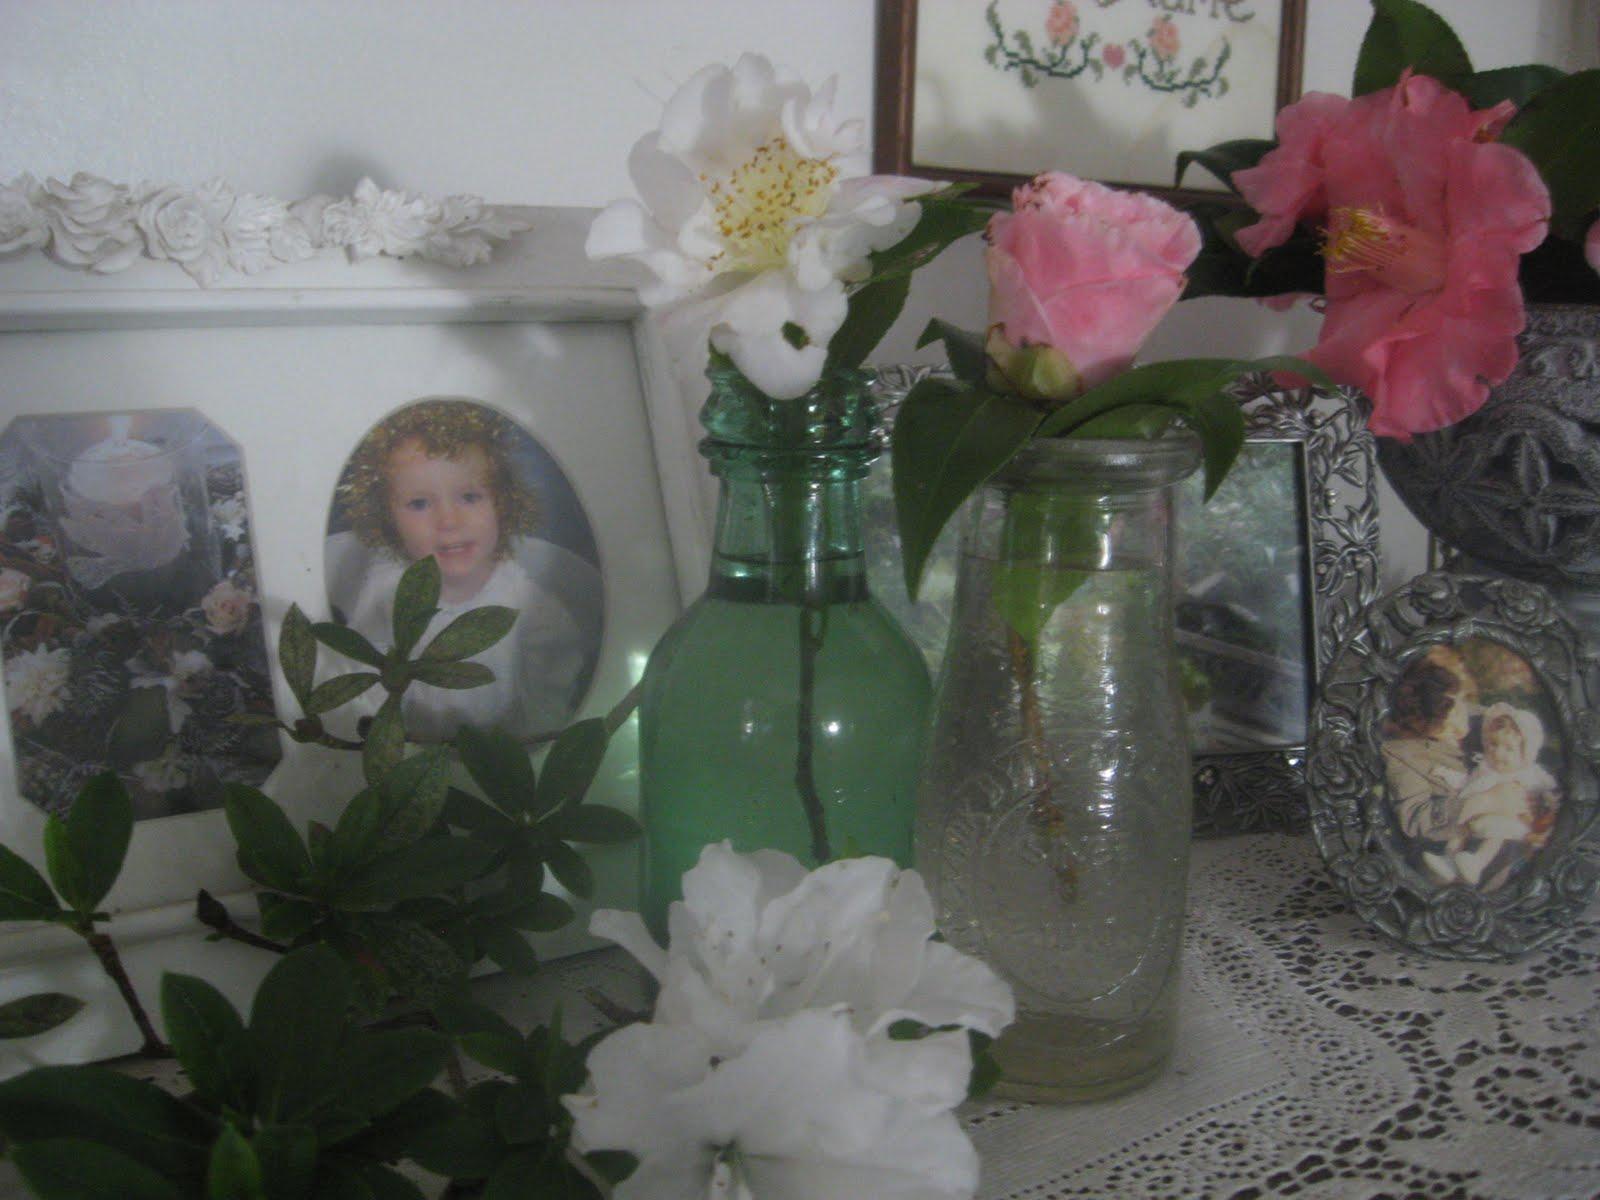 http://2.bp.blogspot.com/-Zxu2qZwwevU/TfAZcQG2emI/AAAAAAAAKGI/hcZliEks-bU/s1600/IMG_1115.JPG